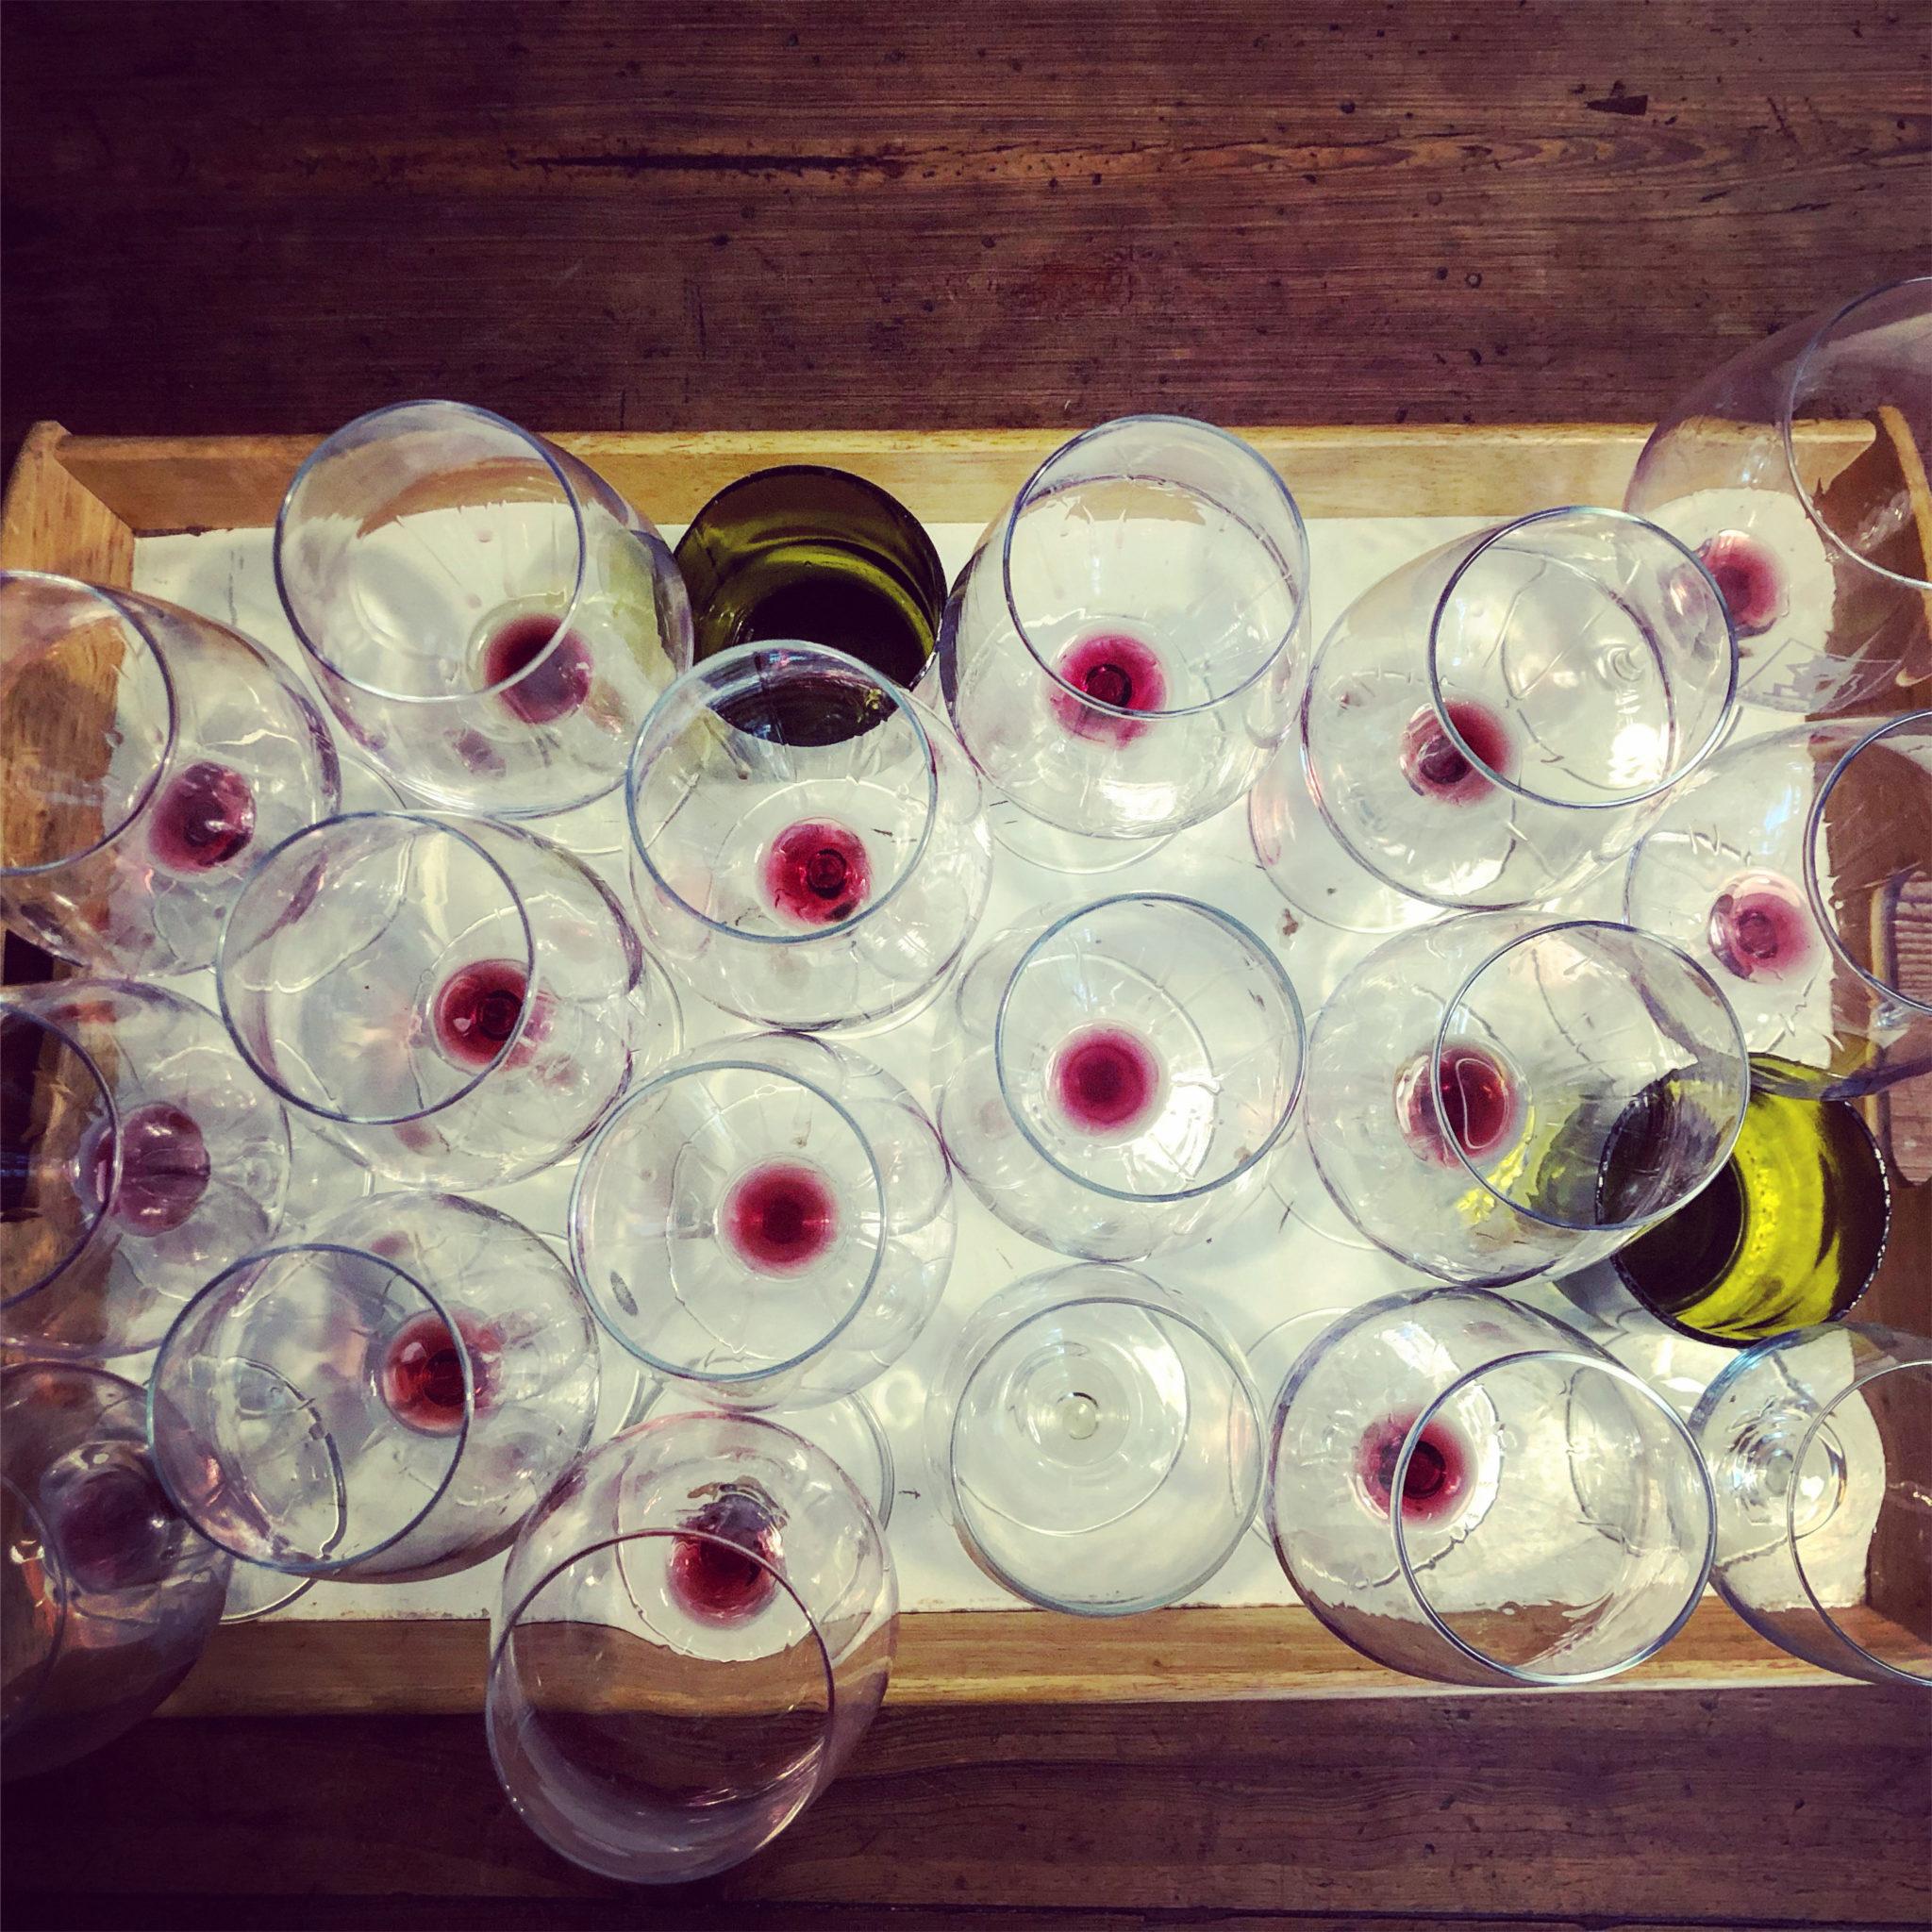 vini bevuti